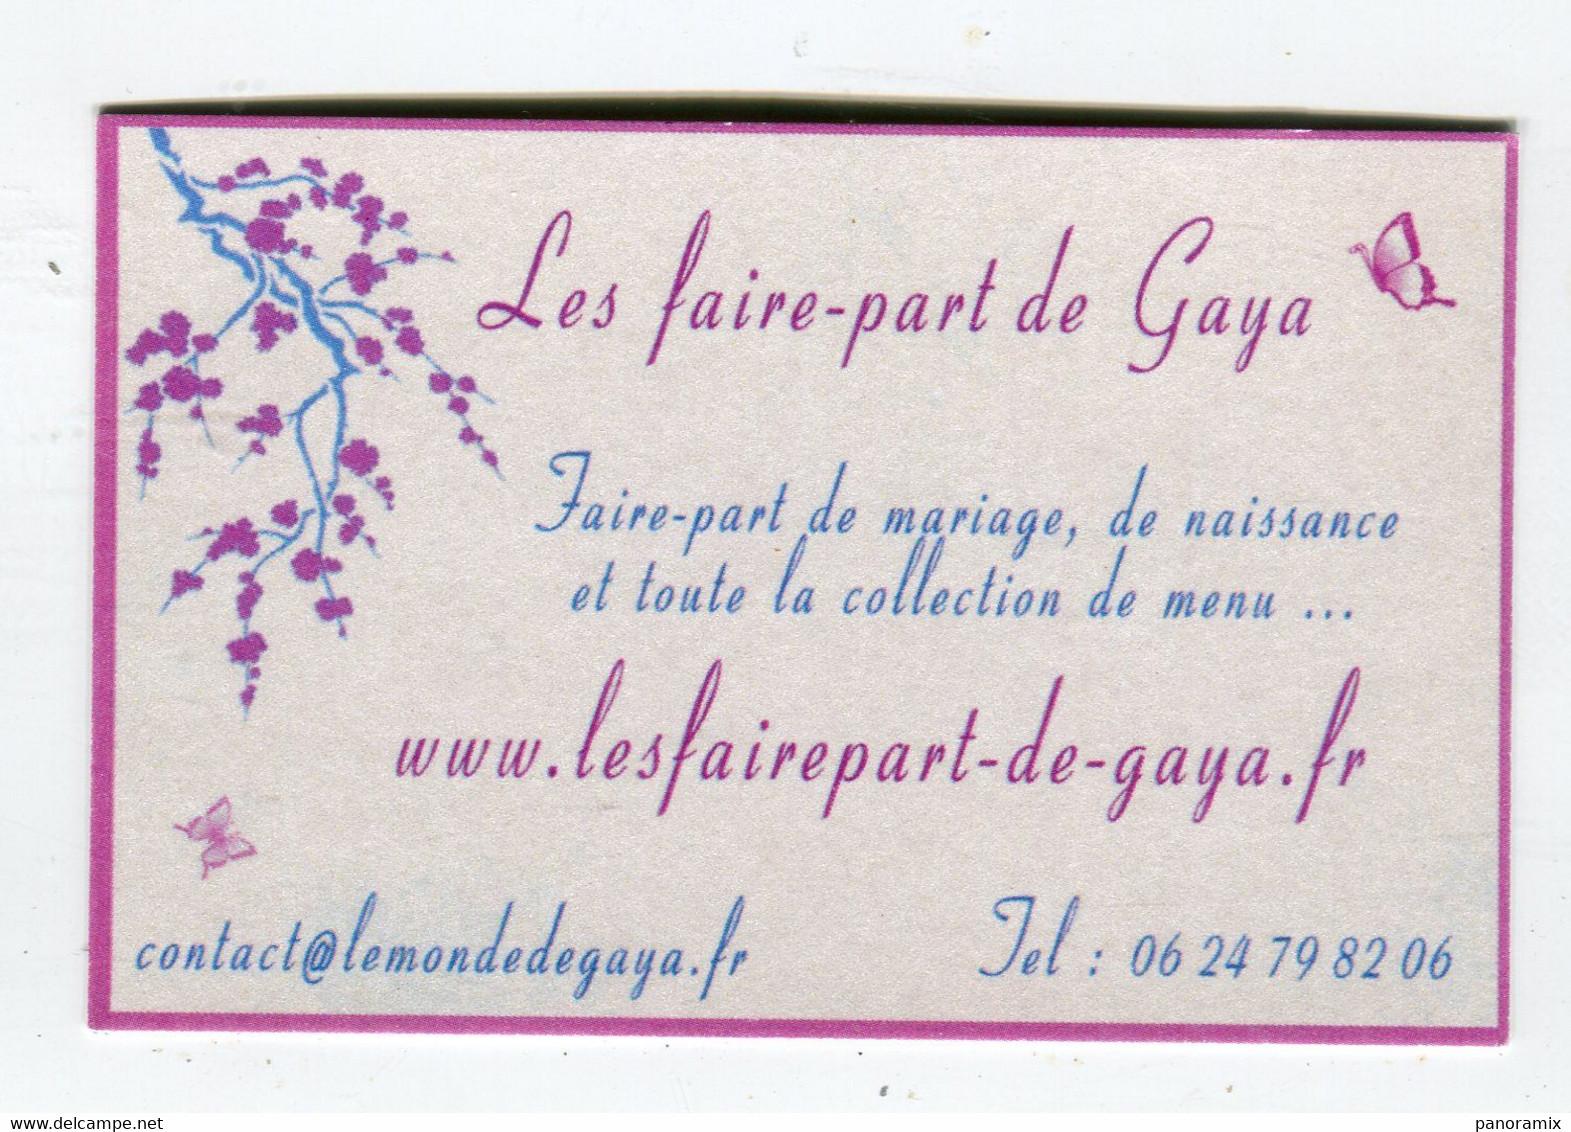 Carte De Visite °_ Carton-Les Faire.Part De Gaya-Contact 06 - Visiting Cards